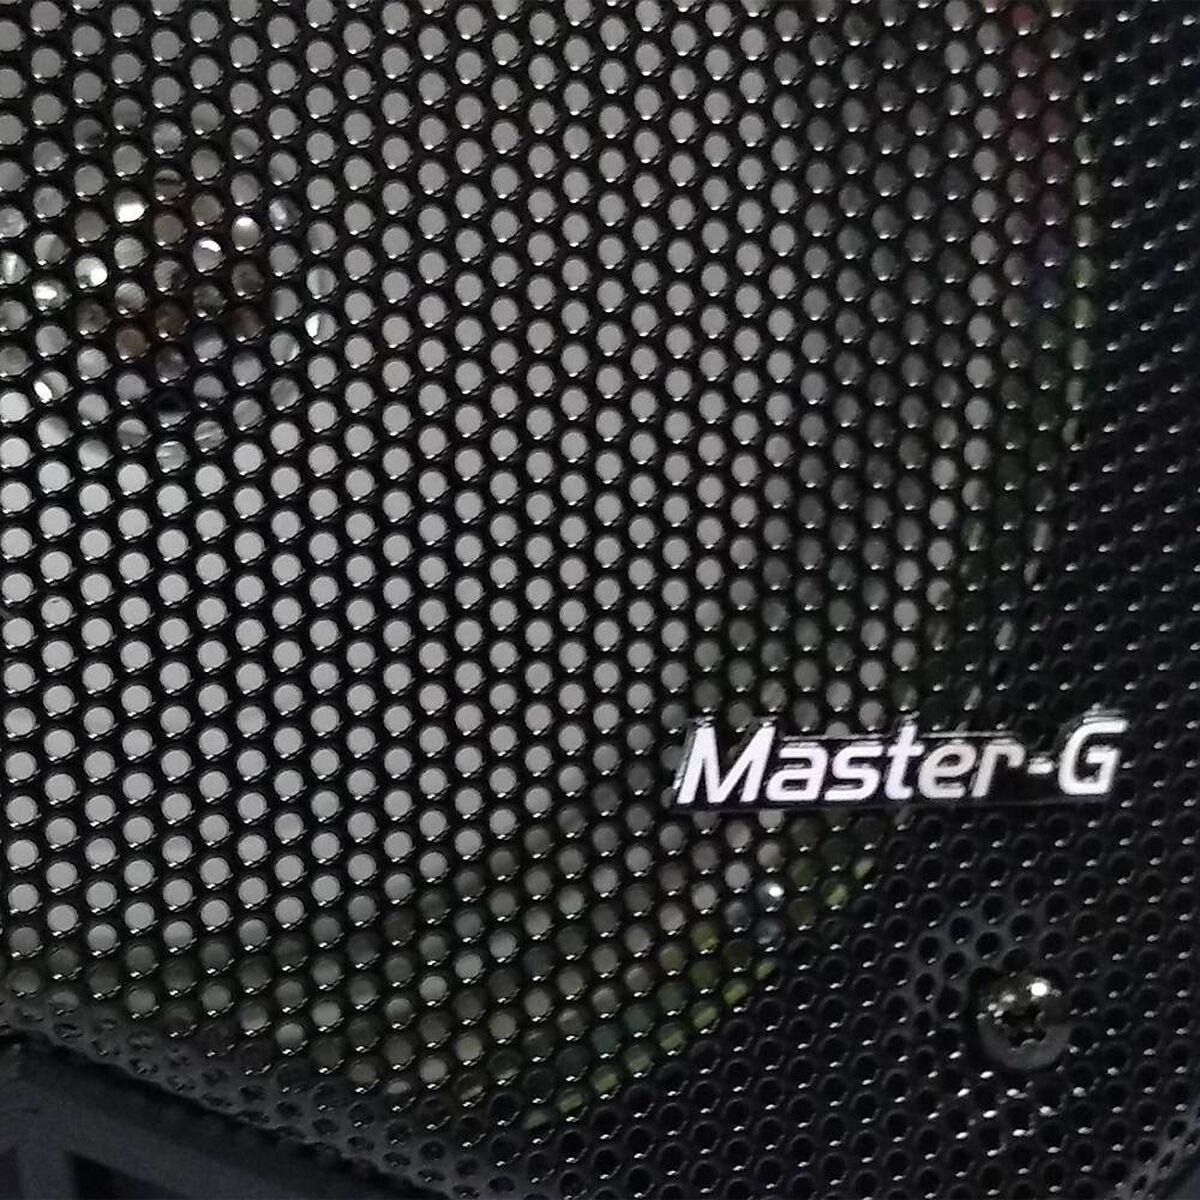 Minicomponente Master-G SPBYF7